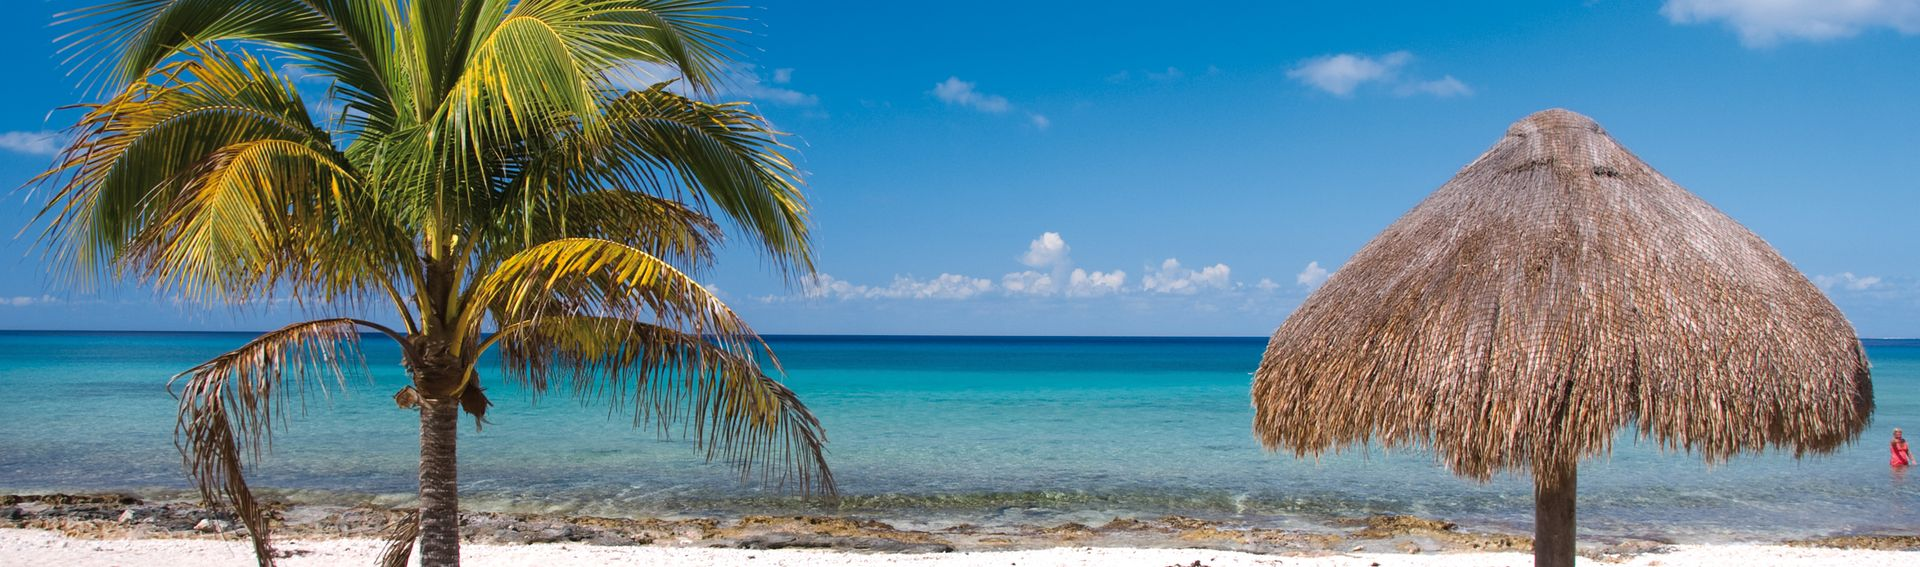 Yucatan Islands